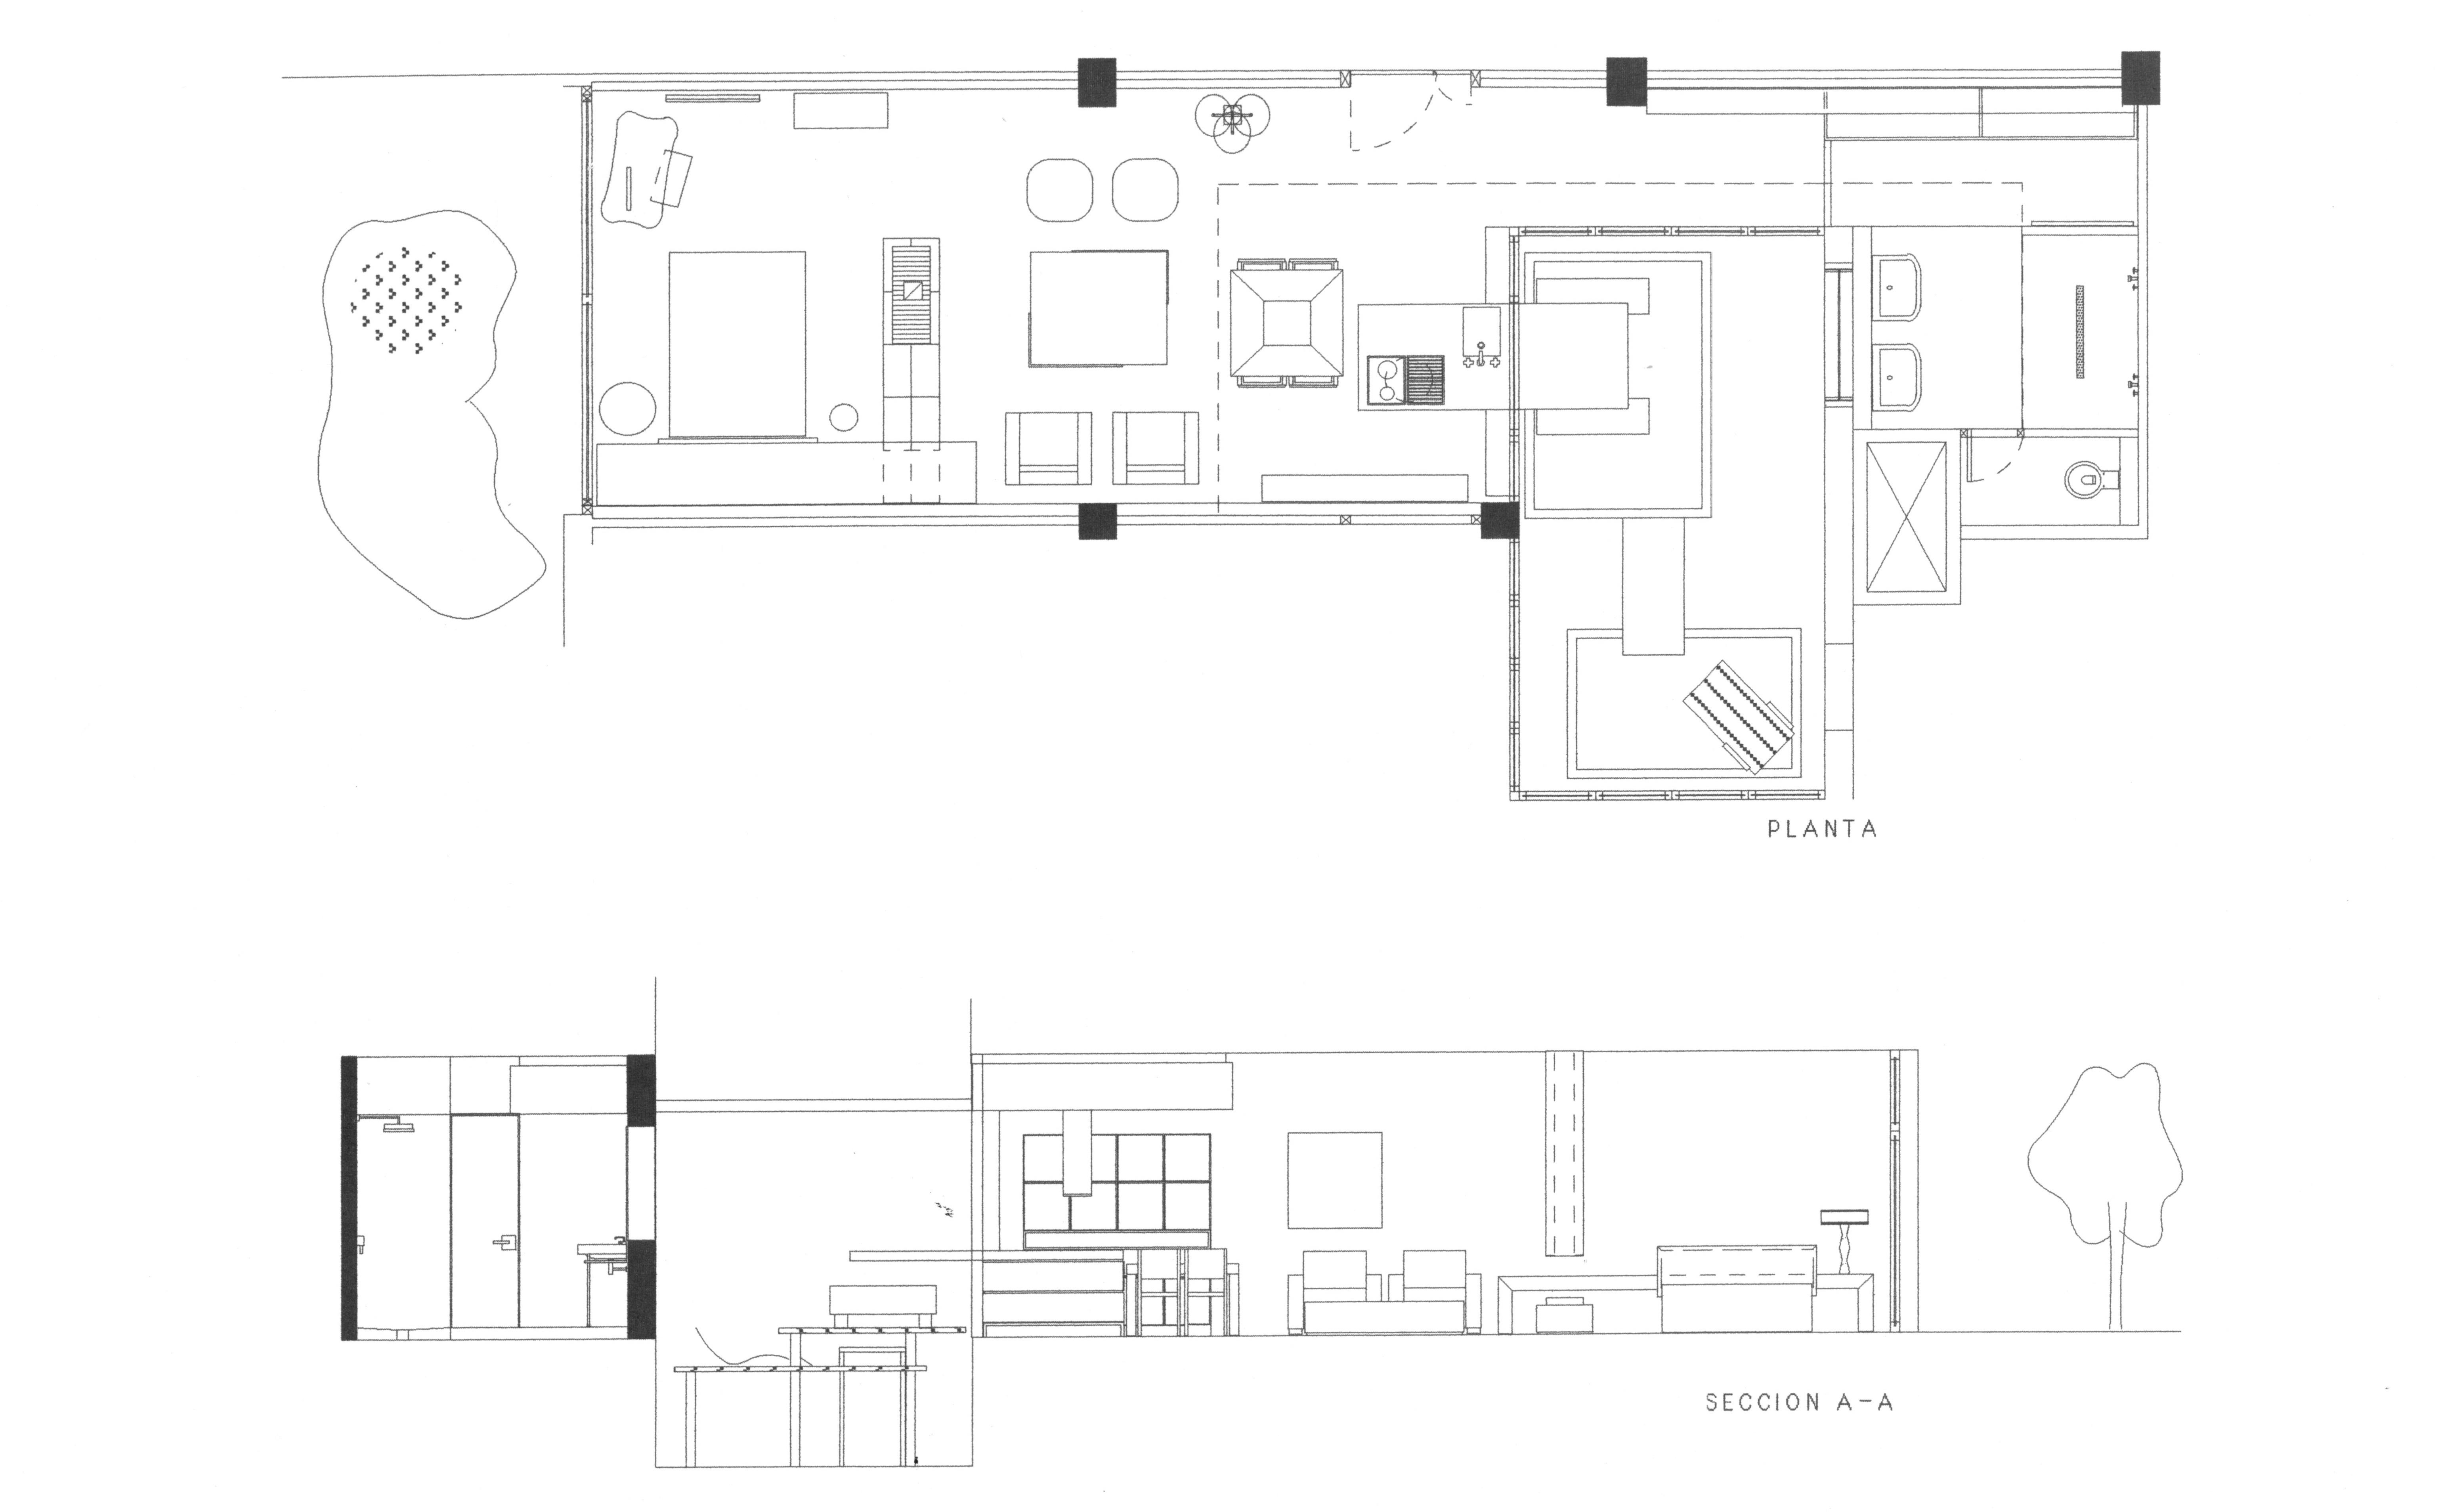 planoloftMaf095 (1)